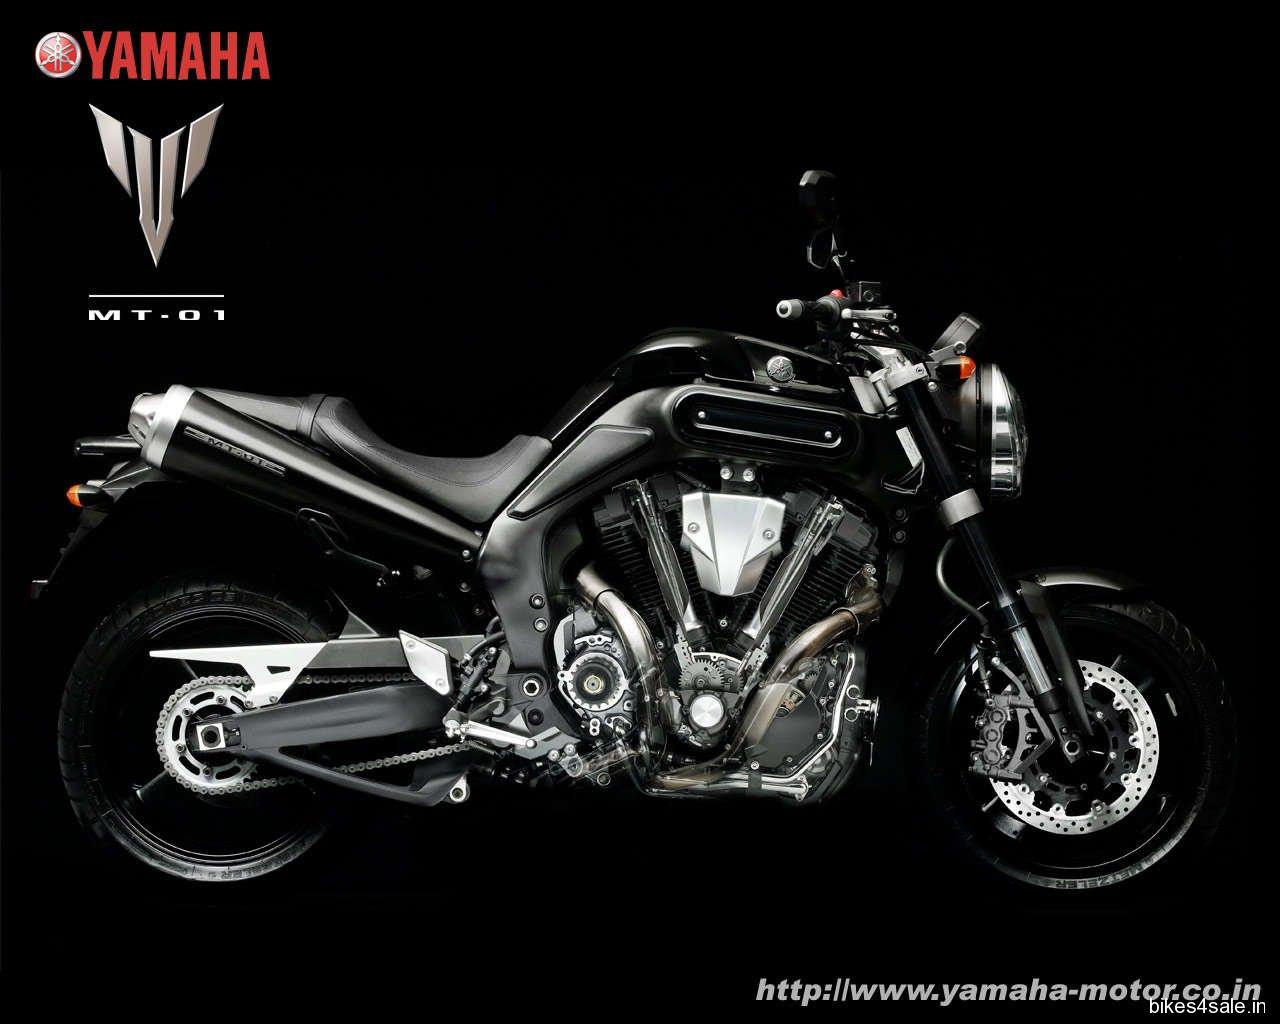 Wallpaper of Yamaha MT01